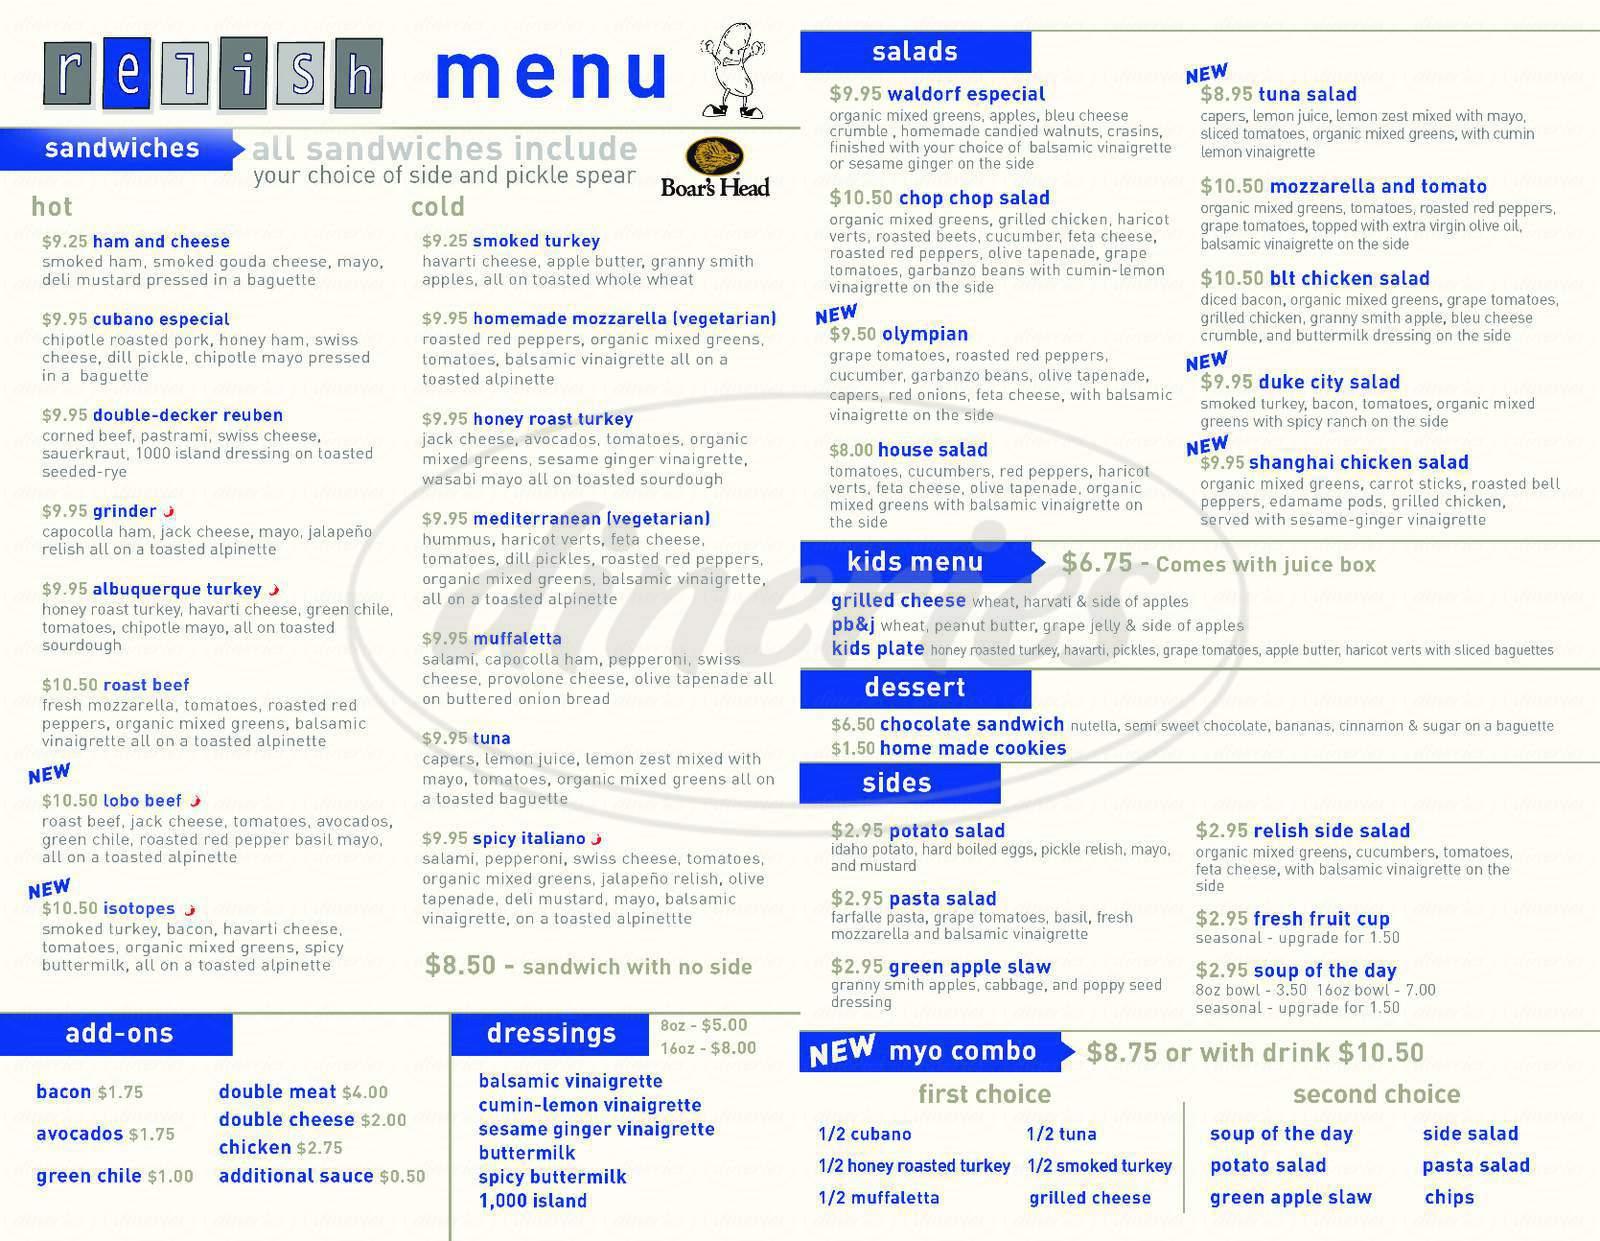 menu for Relish Gourmet Sandwiches